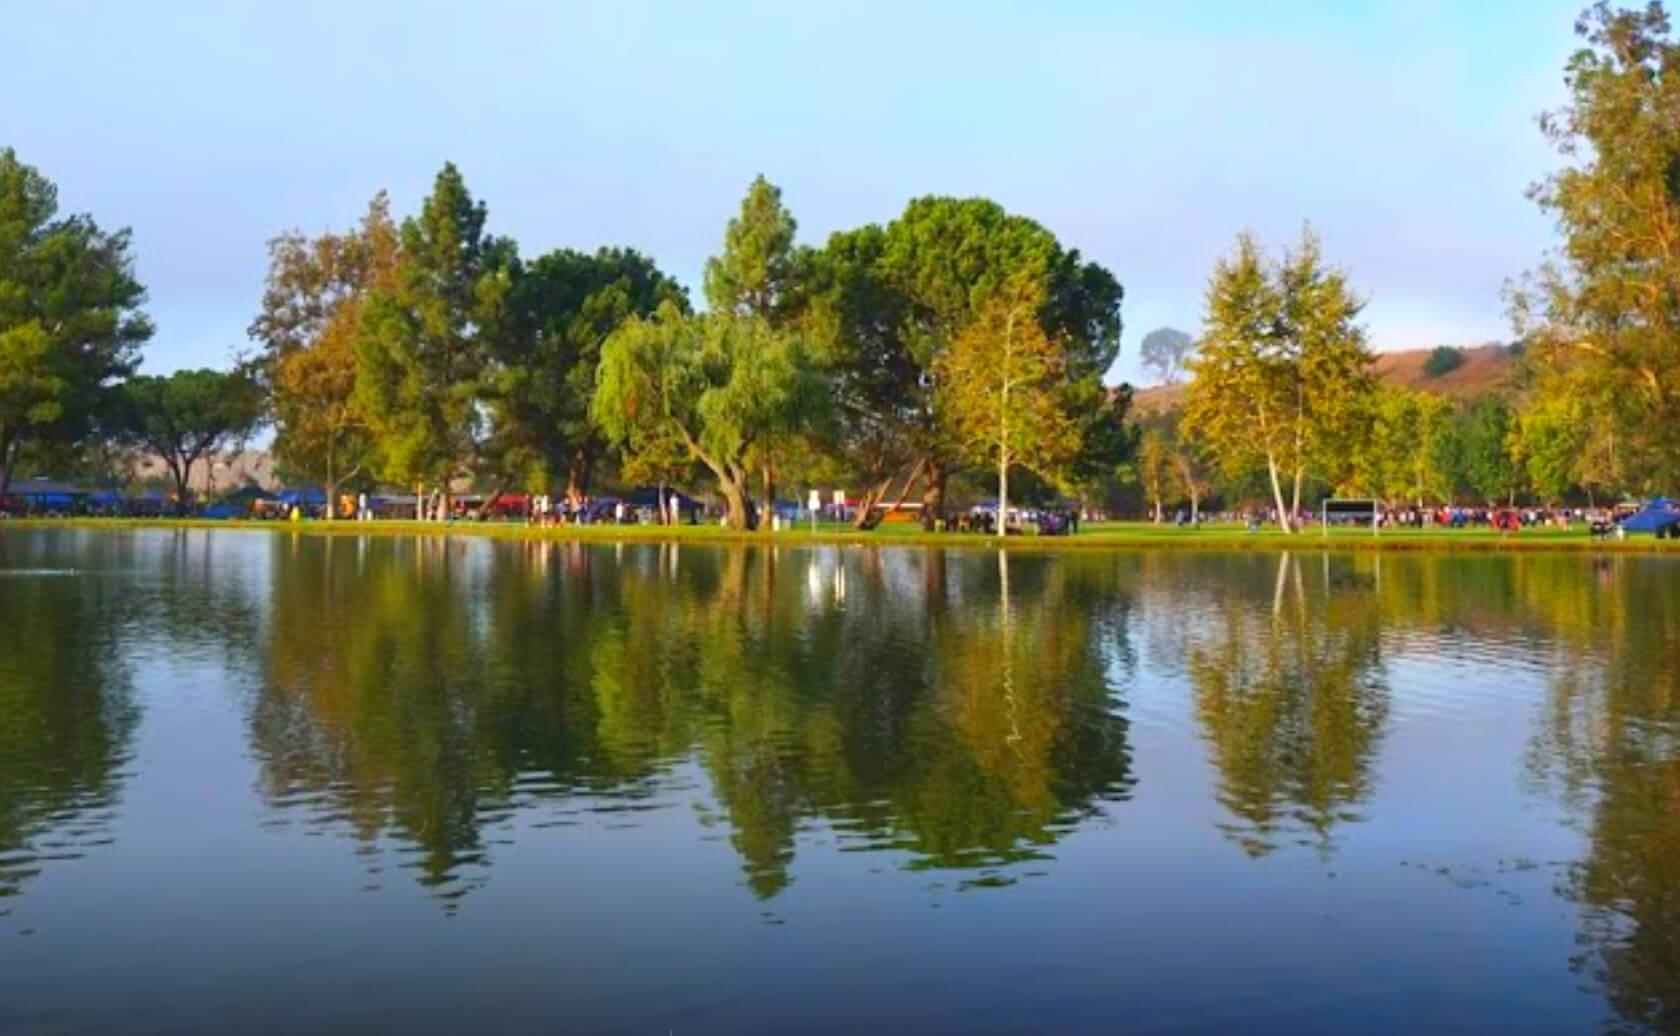 Carbon-Canyon-Park-Lake-Fishing-Guide-Report-Brea-CA-04